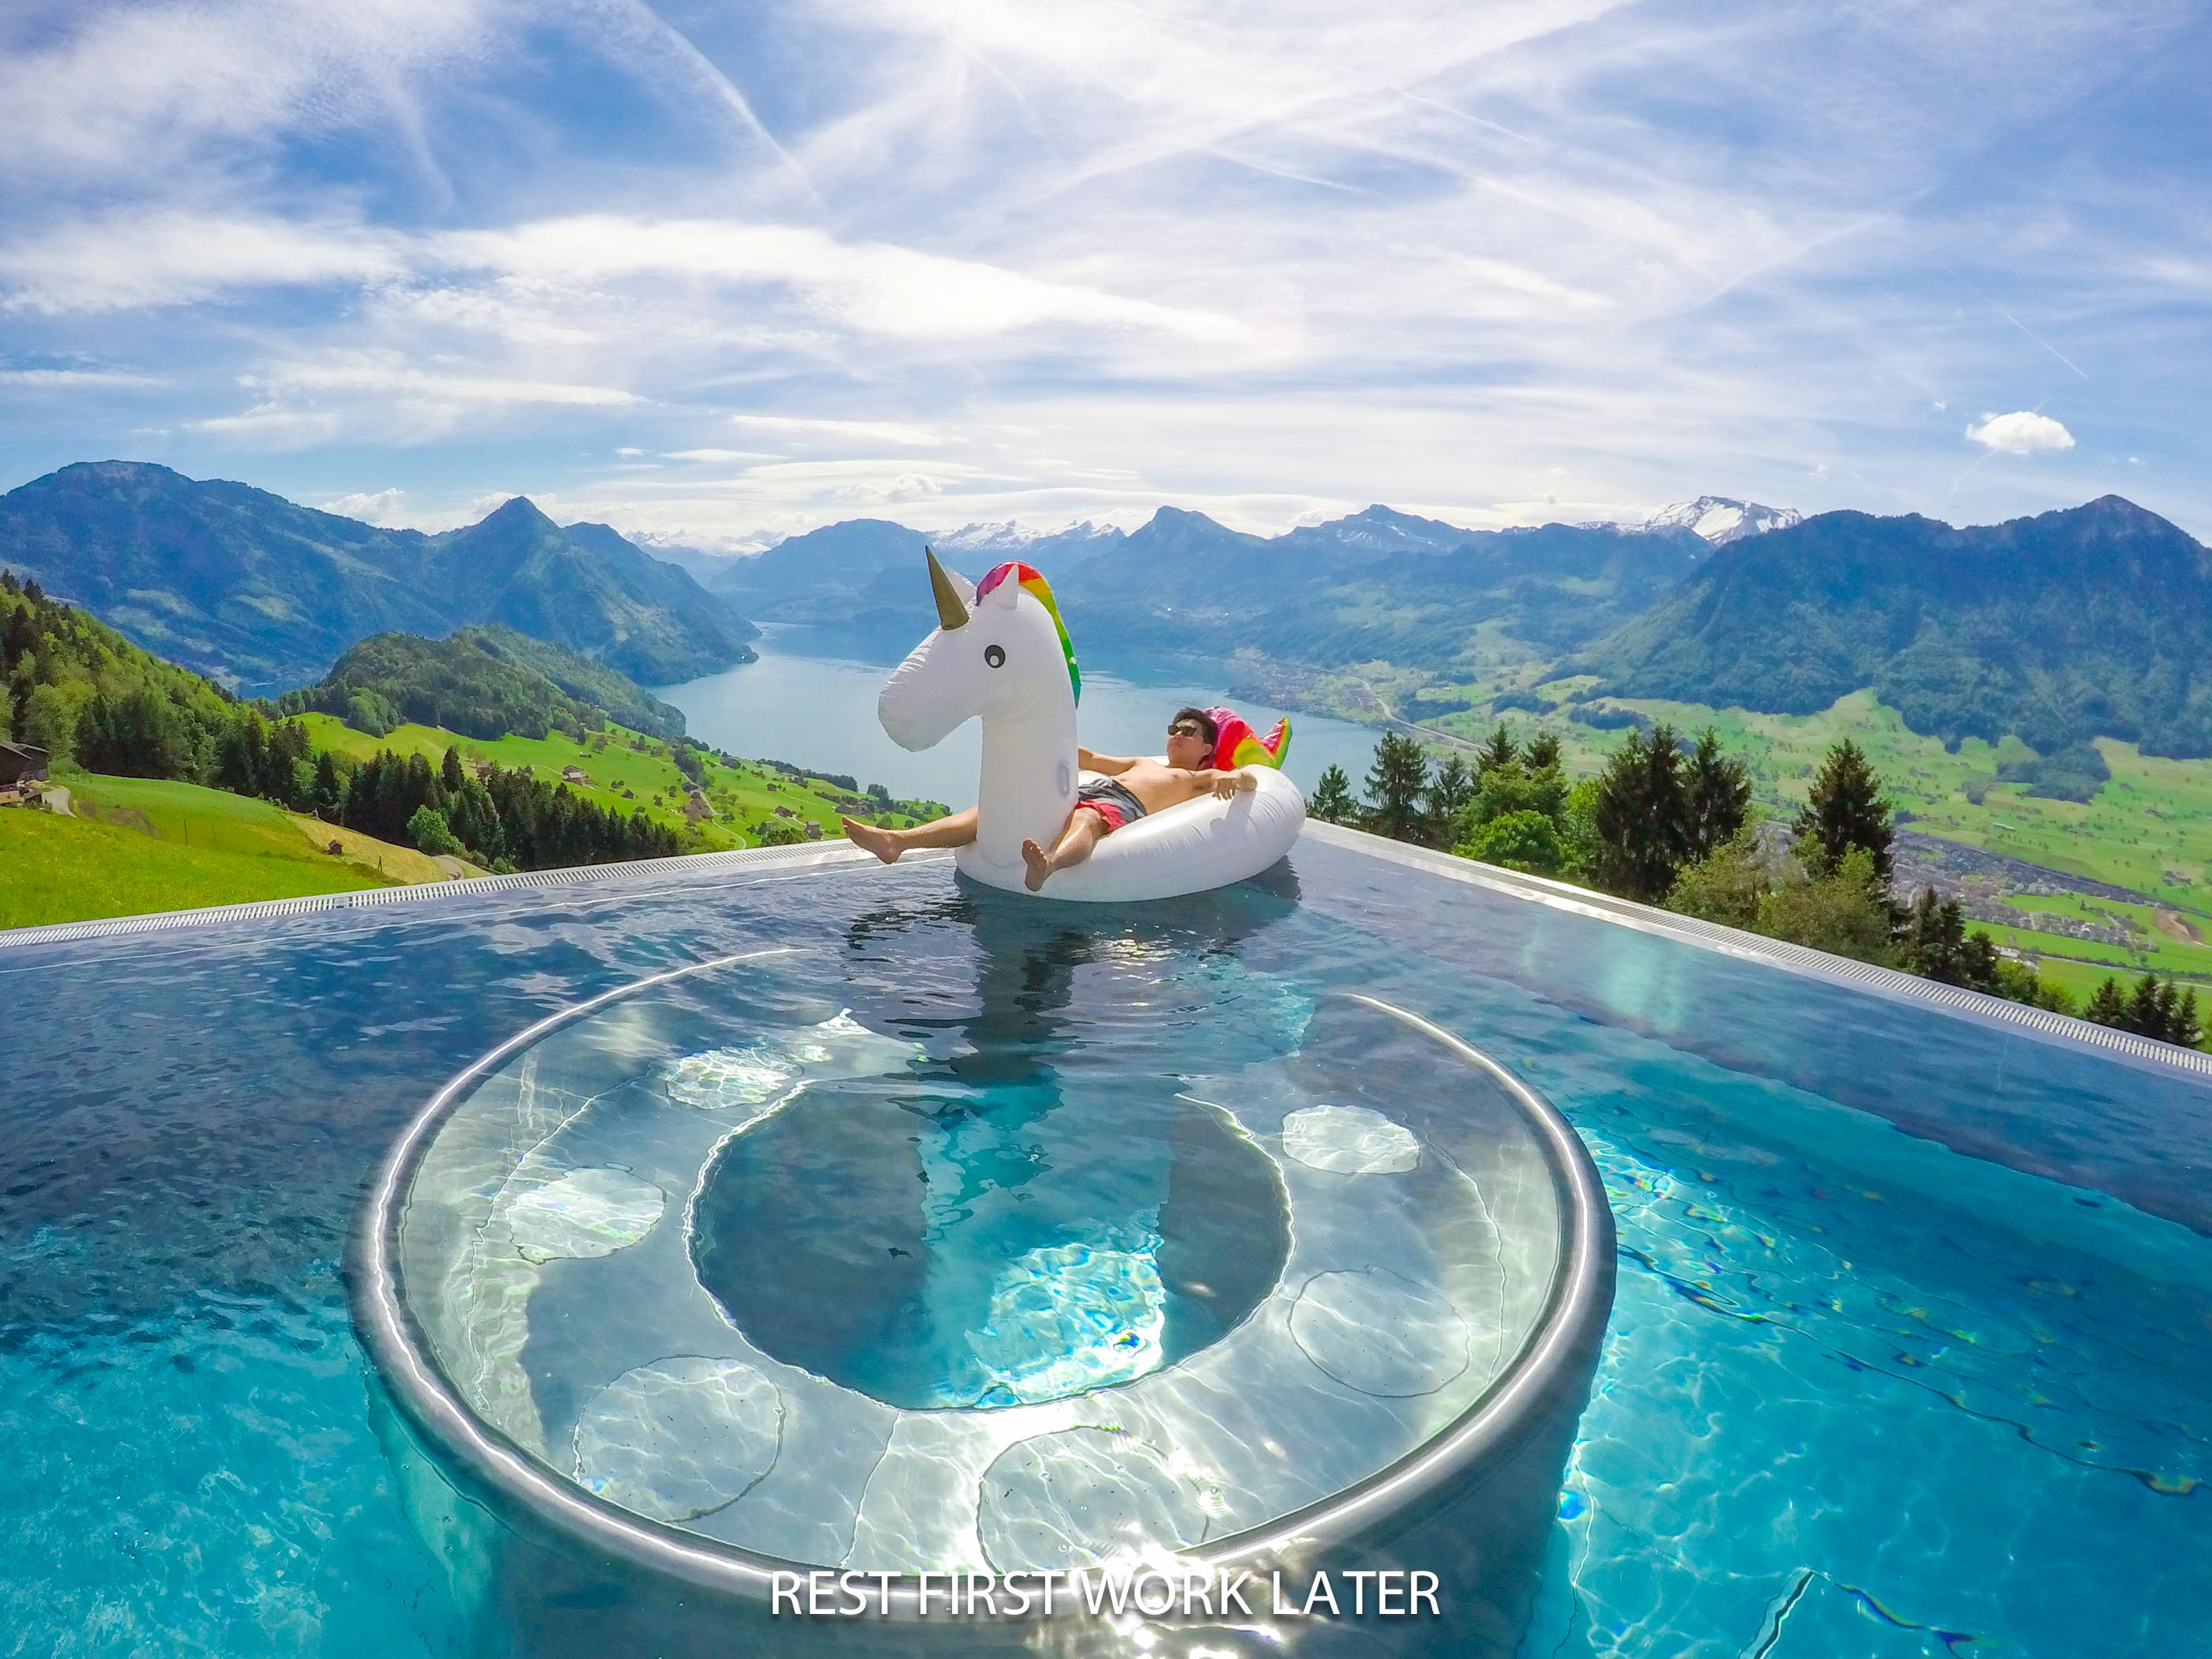 Hotel Villa Honegg dedans hotel villa honegg :: โรงแรมที่สวยที่สุดในโลก สวรรค์มีอยู่จริงที่